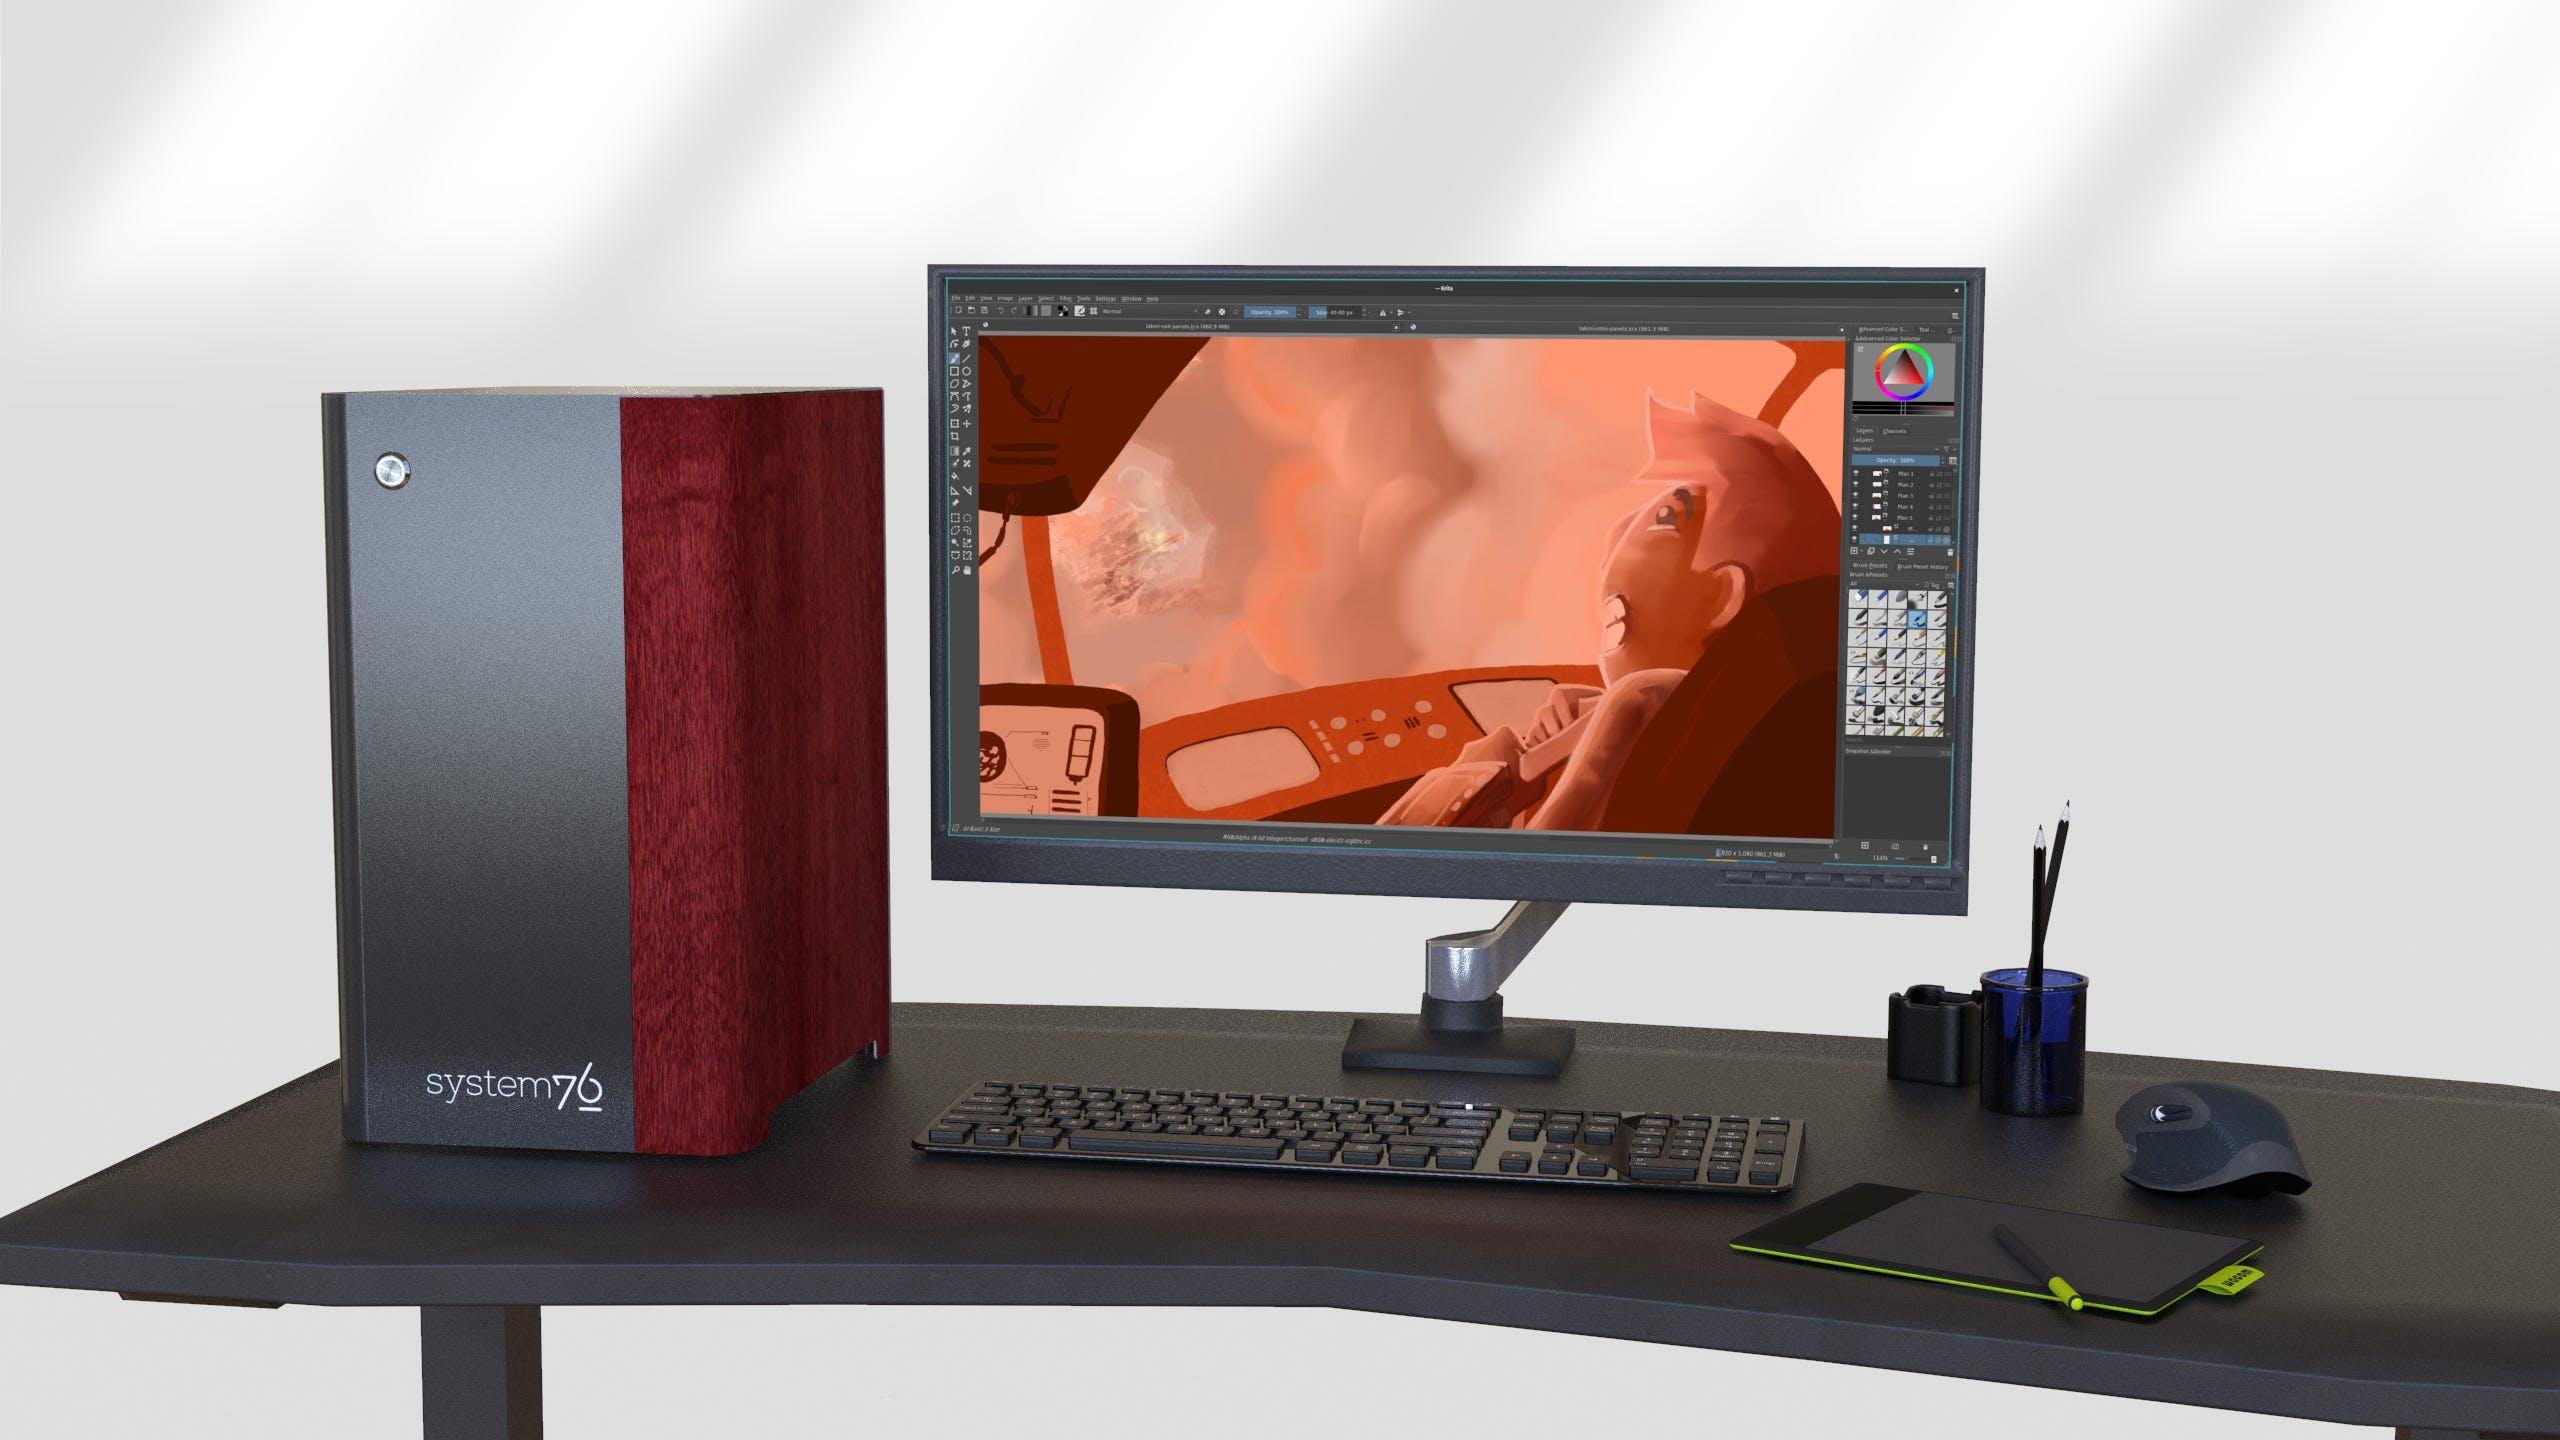 Desk setup with Thelio, external monitor, keyboard, glasses and a coffee mug.